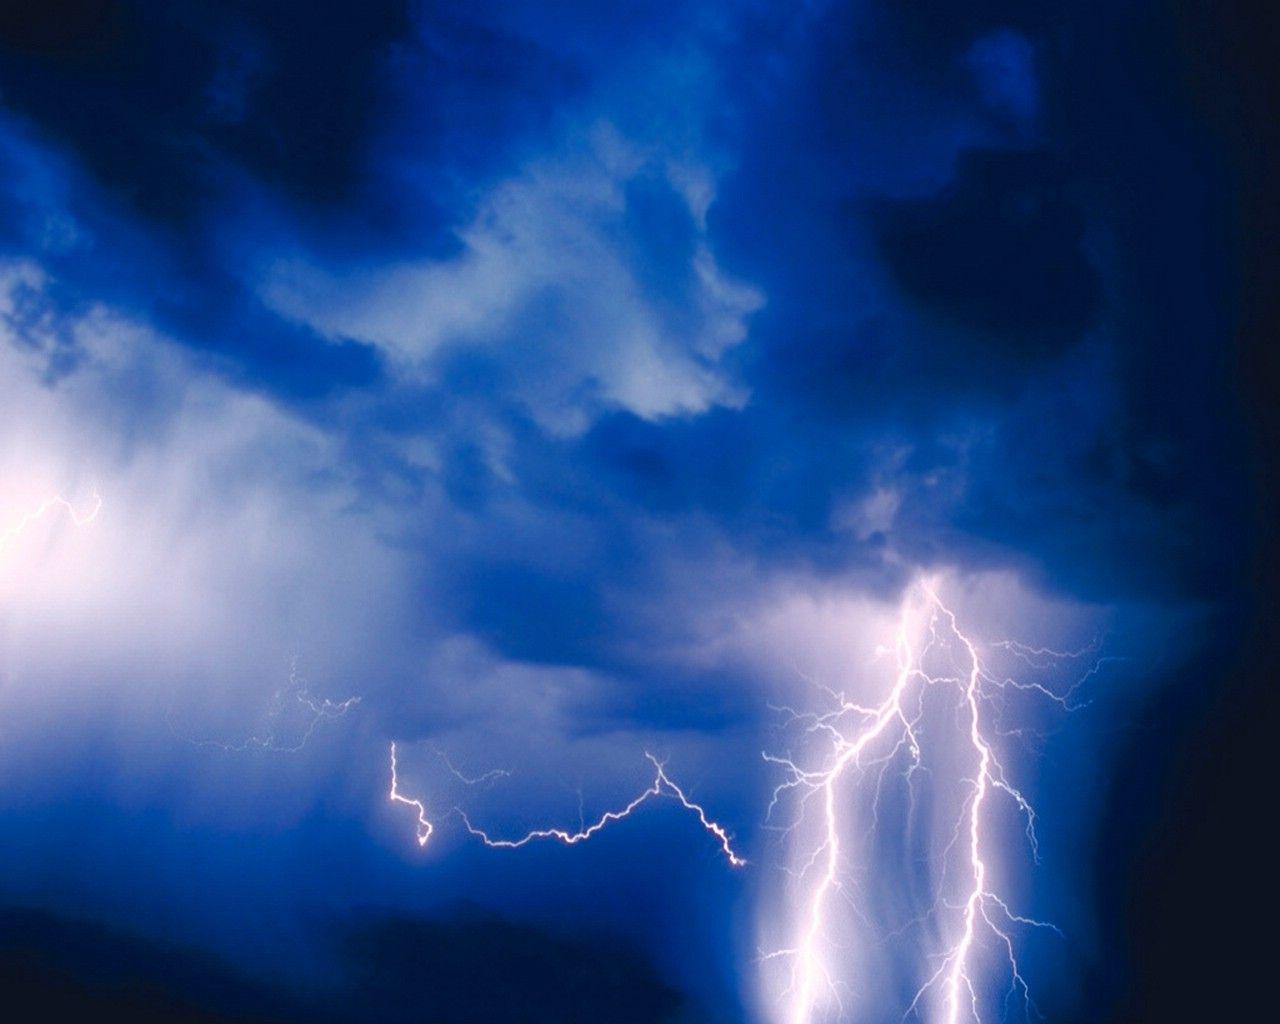 cab28577a74c5 pics of lightning strikes | XMWallpapers.com -- wallpaper storms ...